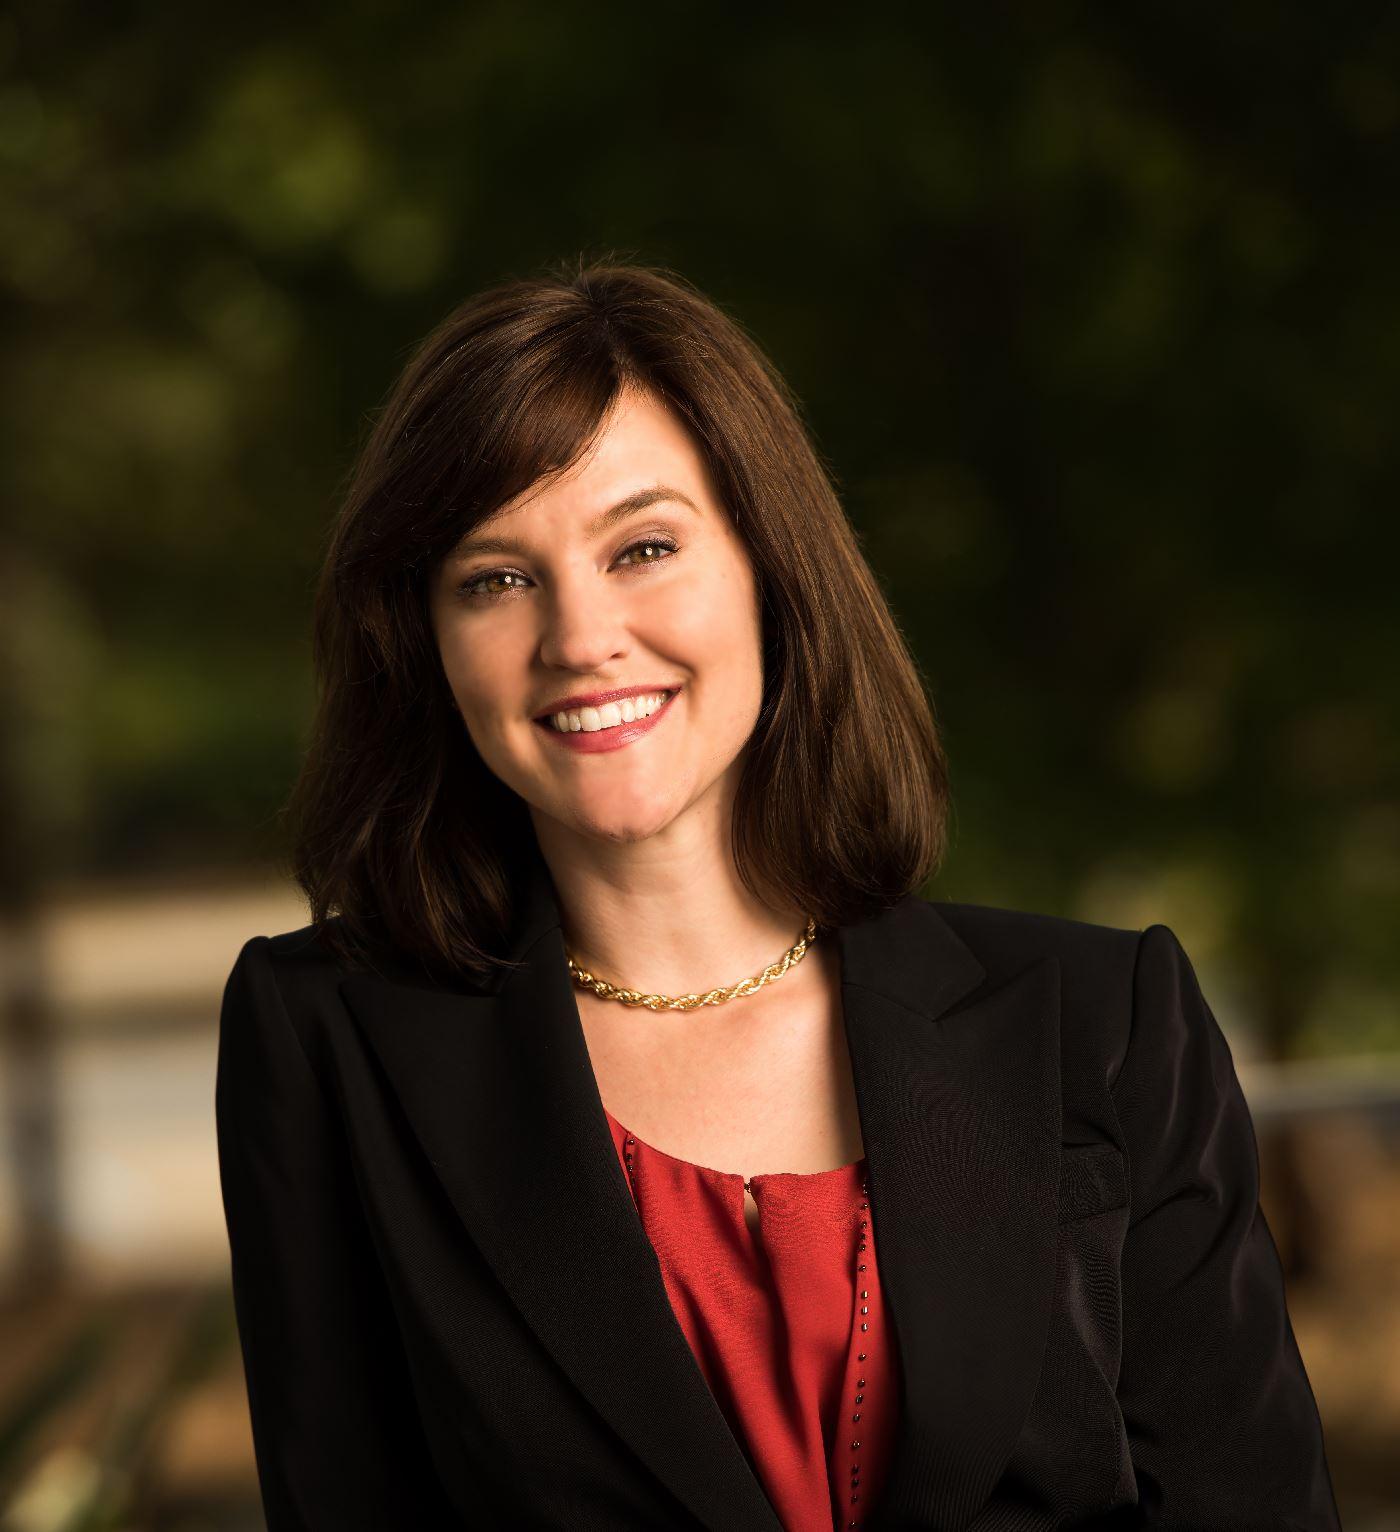 Tiffany Toliver, PE, LEED AP